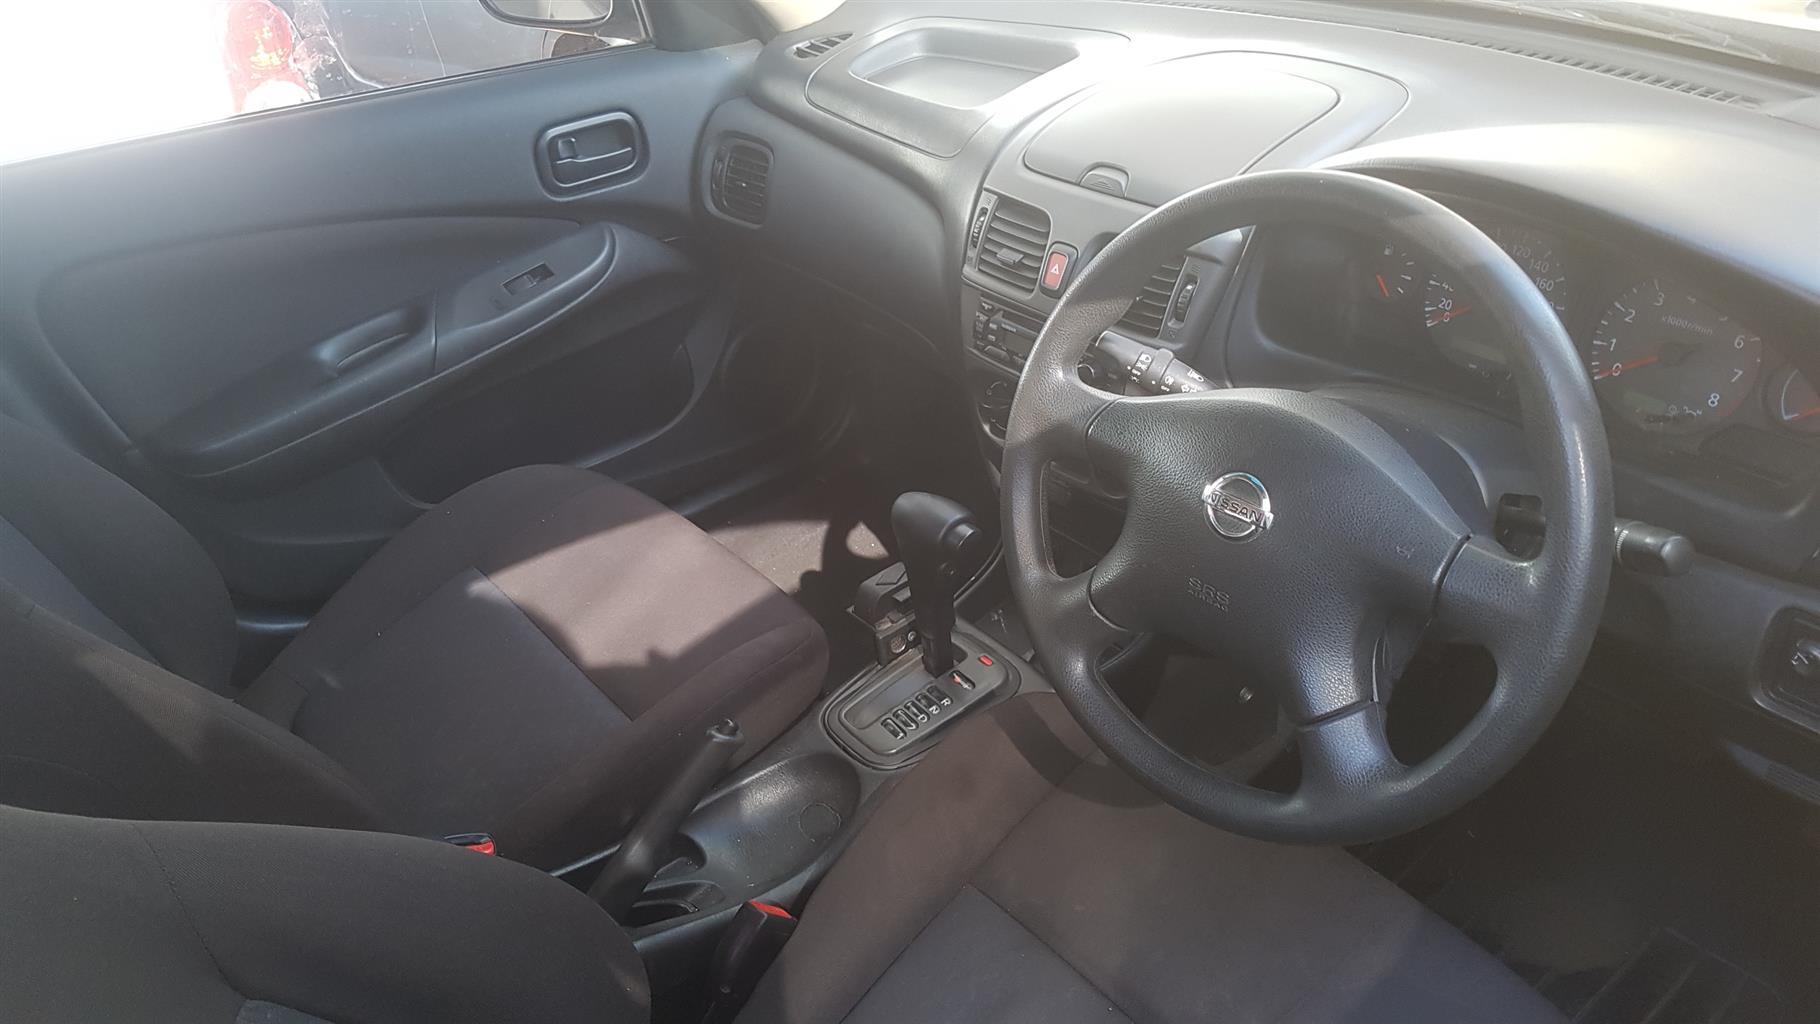 2005 Nissan Almera 1.6 Luxury automatic